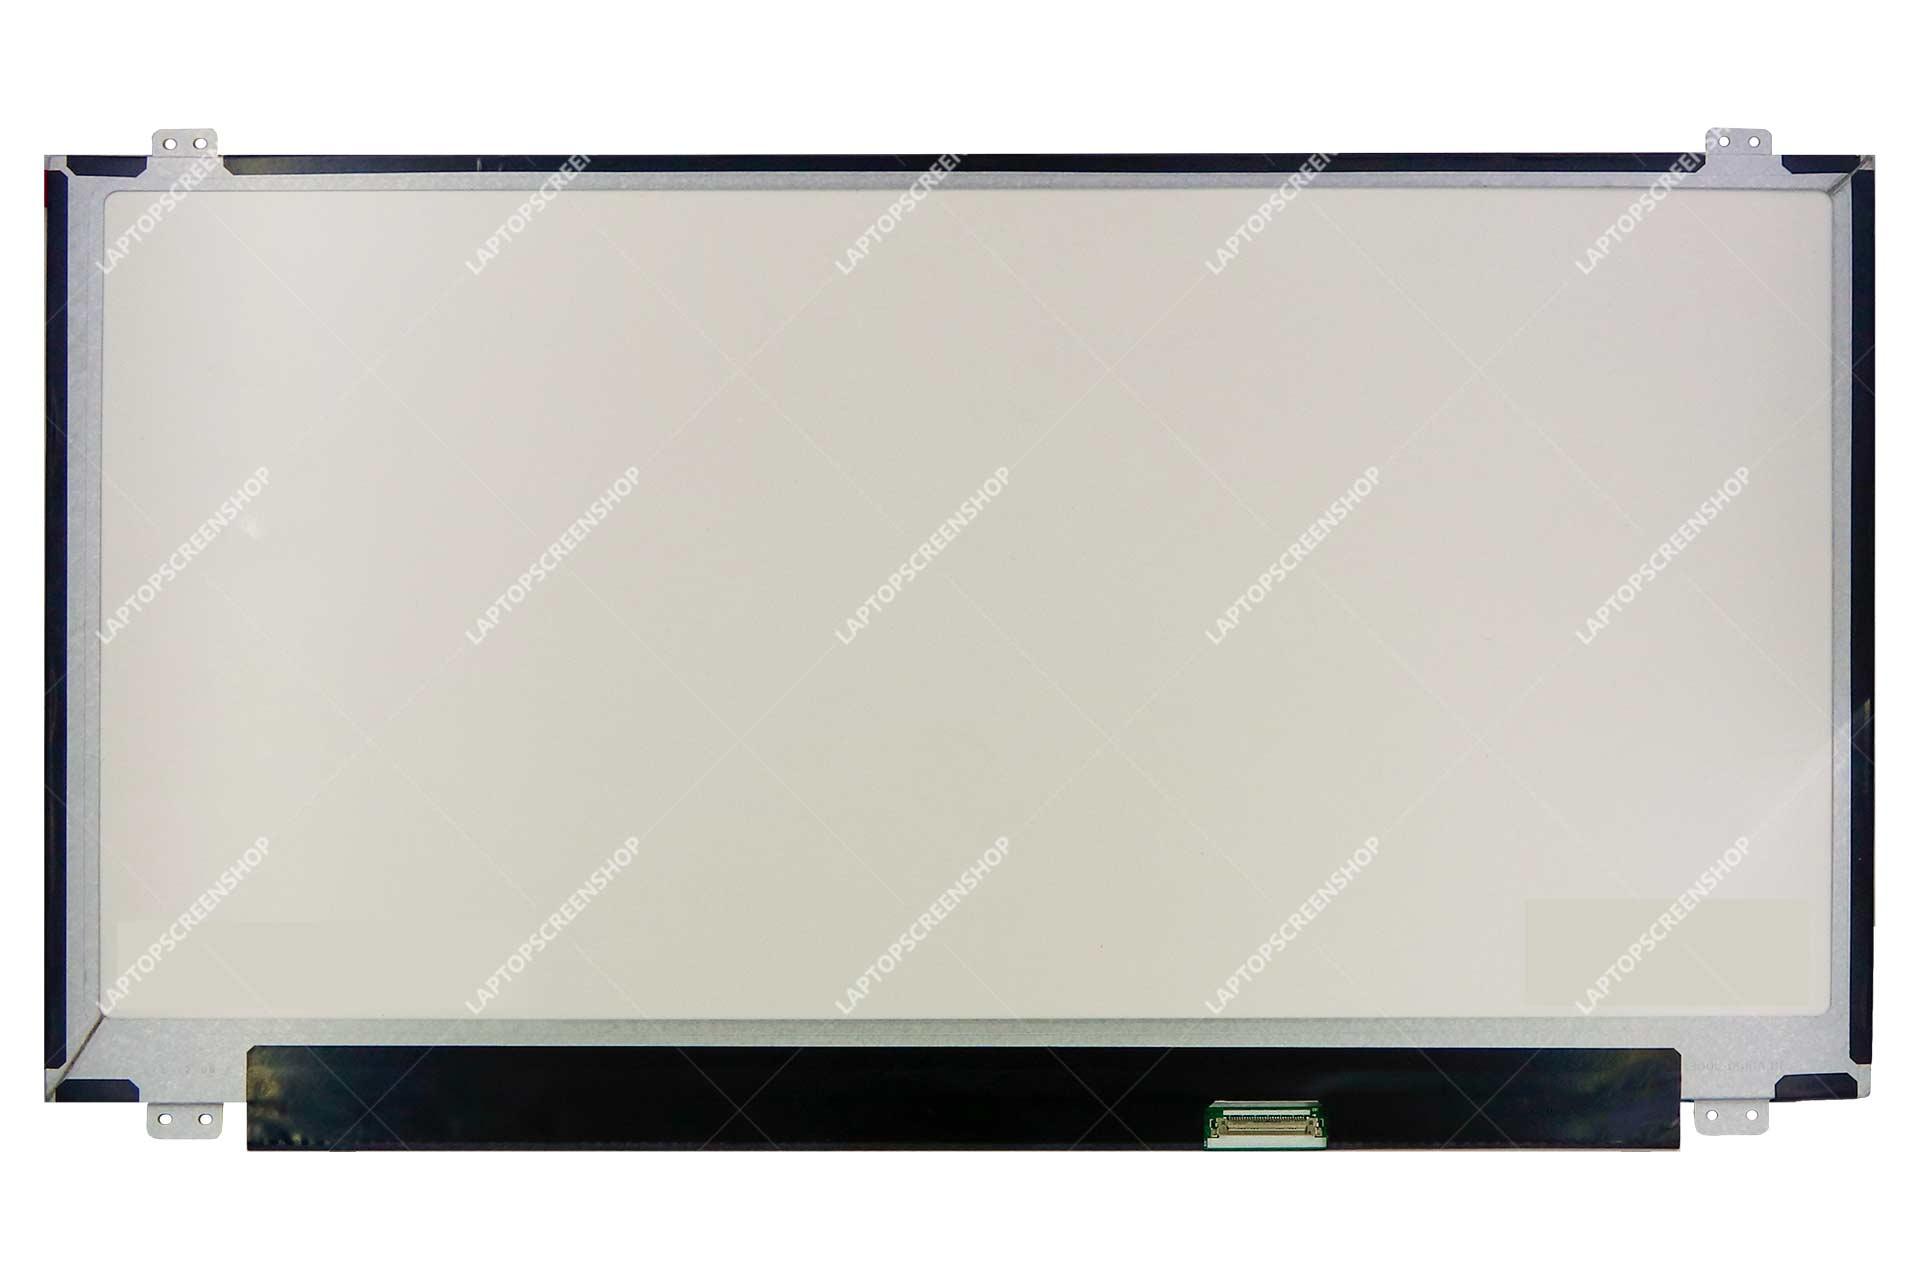 ACER-ASPIRE-E1-510-4899-LCD  HD فروشگاه لپ تاپ اسکرين   تعمير لپ تاپ